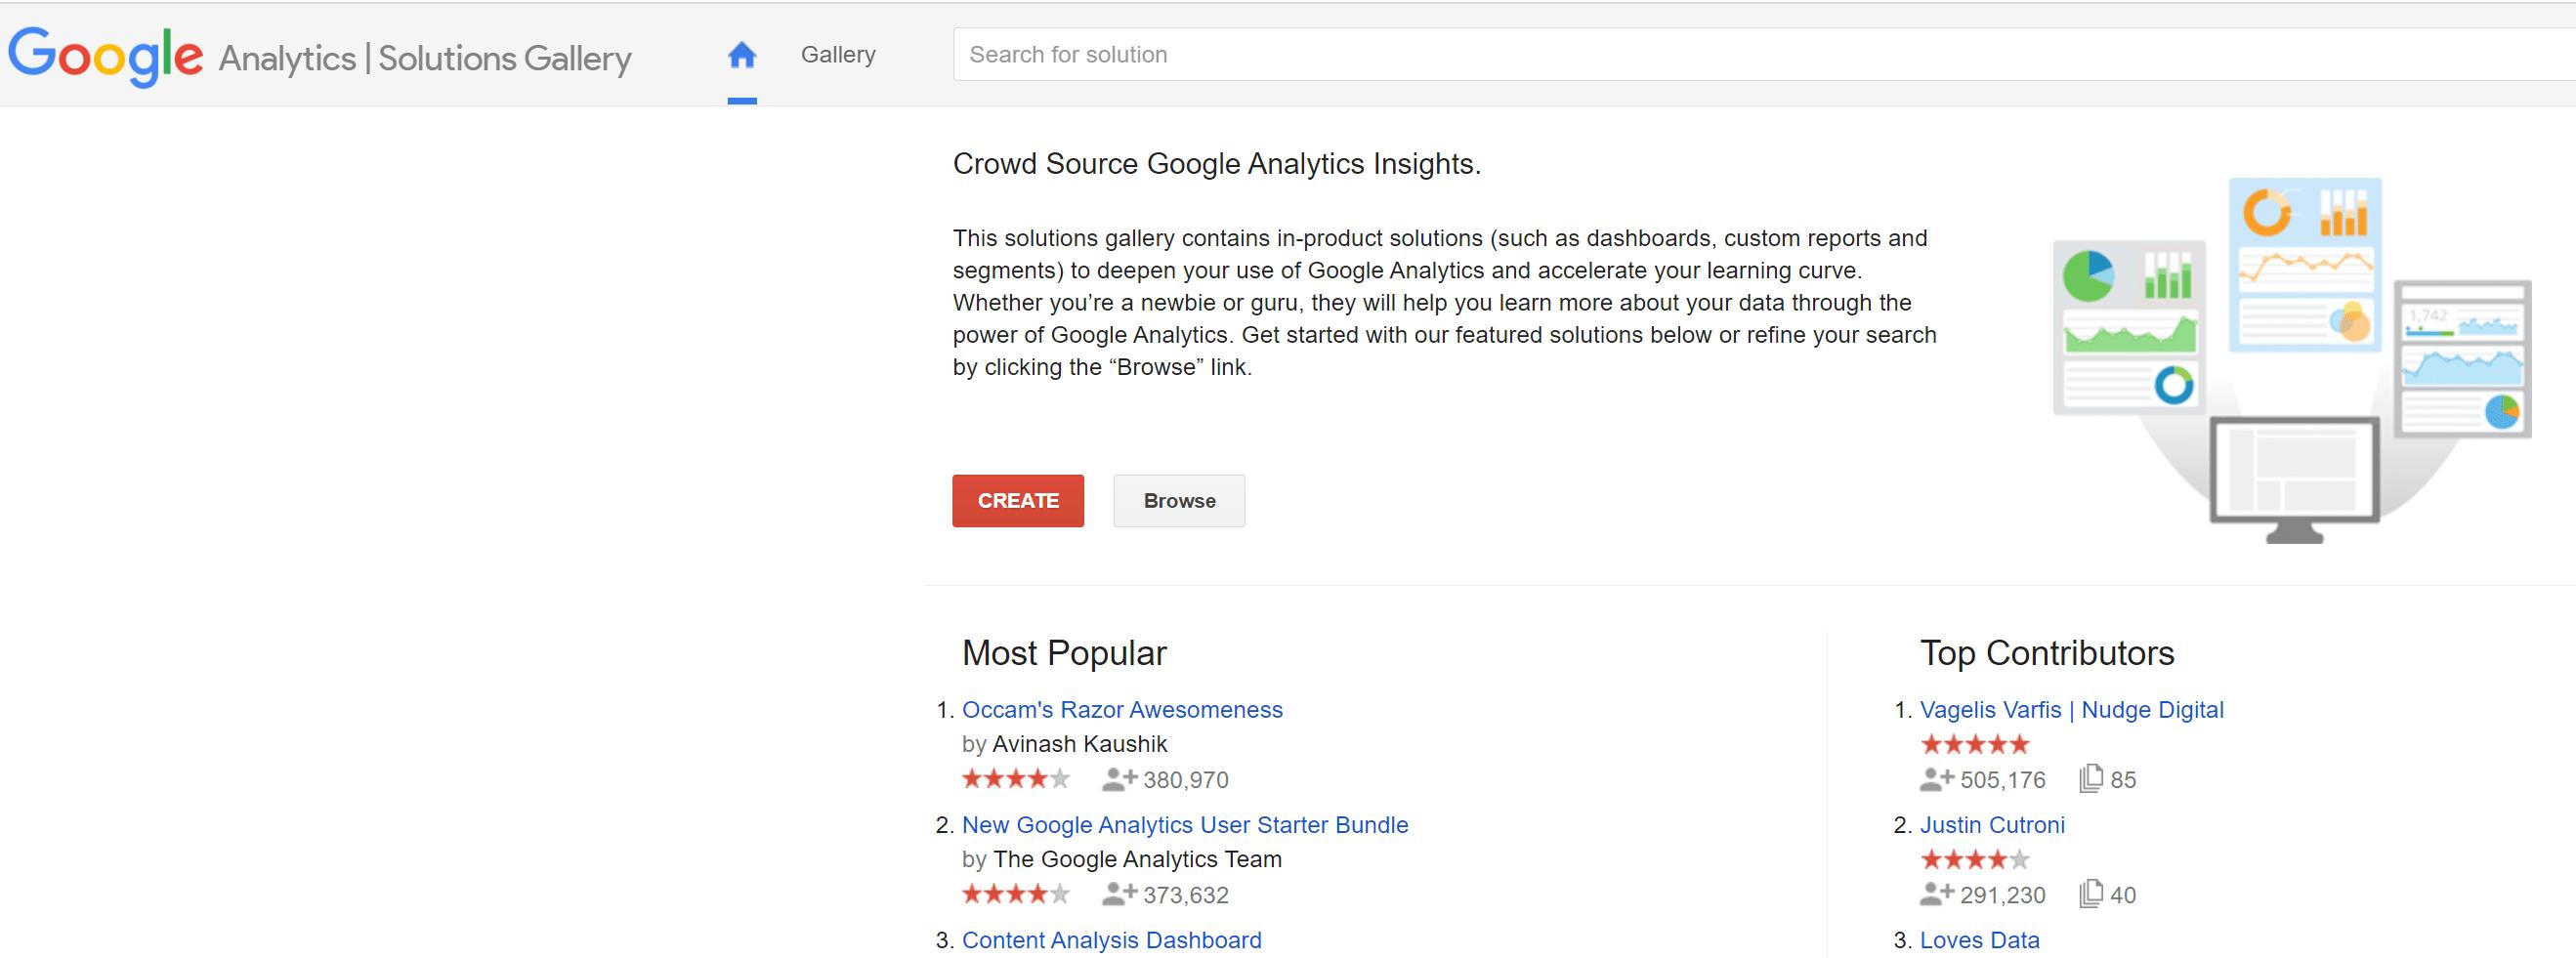 Google Analytics Solution Gallery